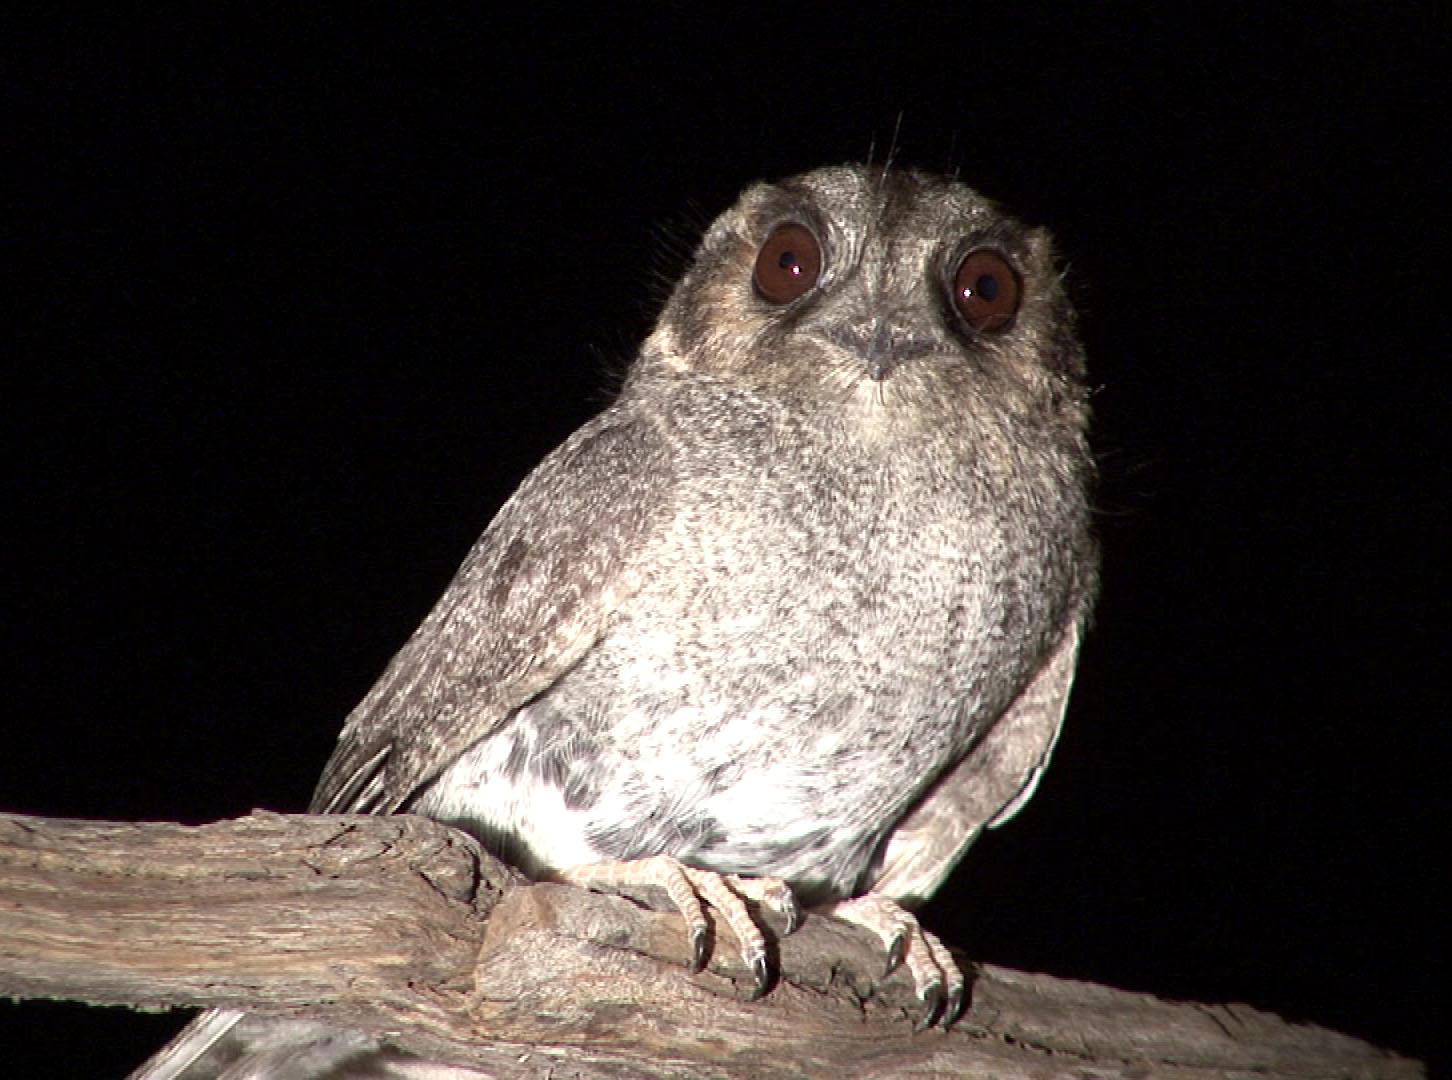 Australian Owlet-nightjar on the branch